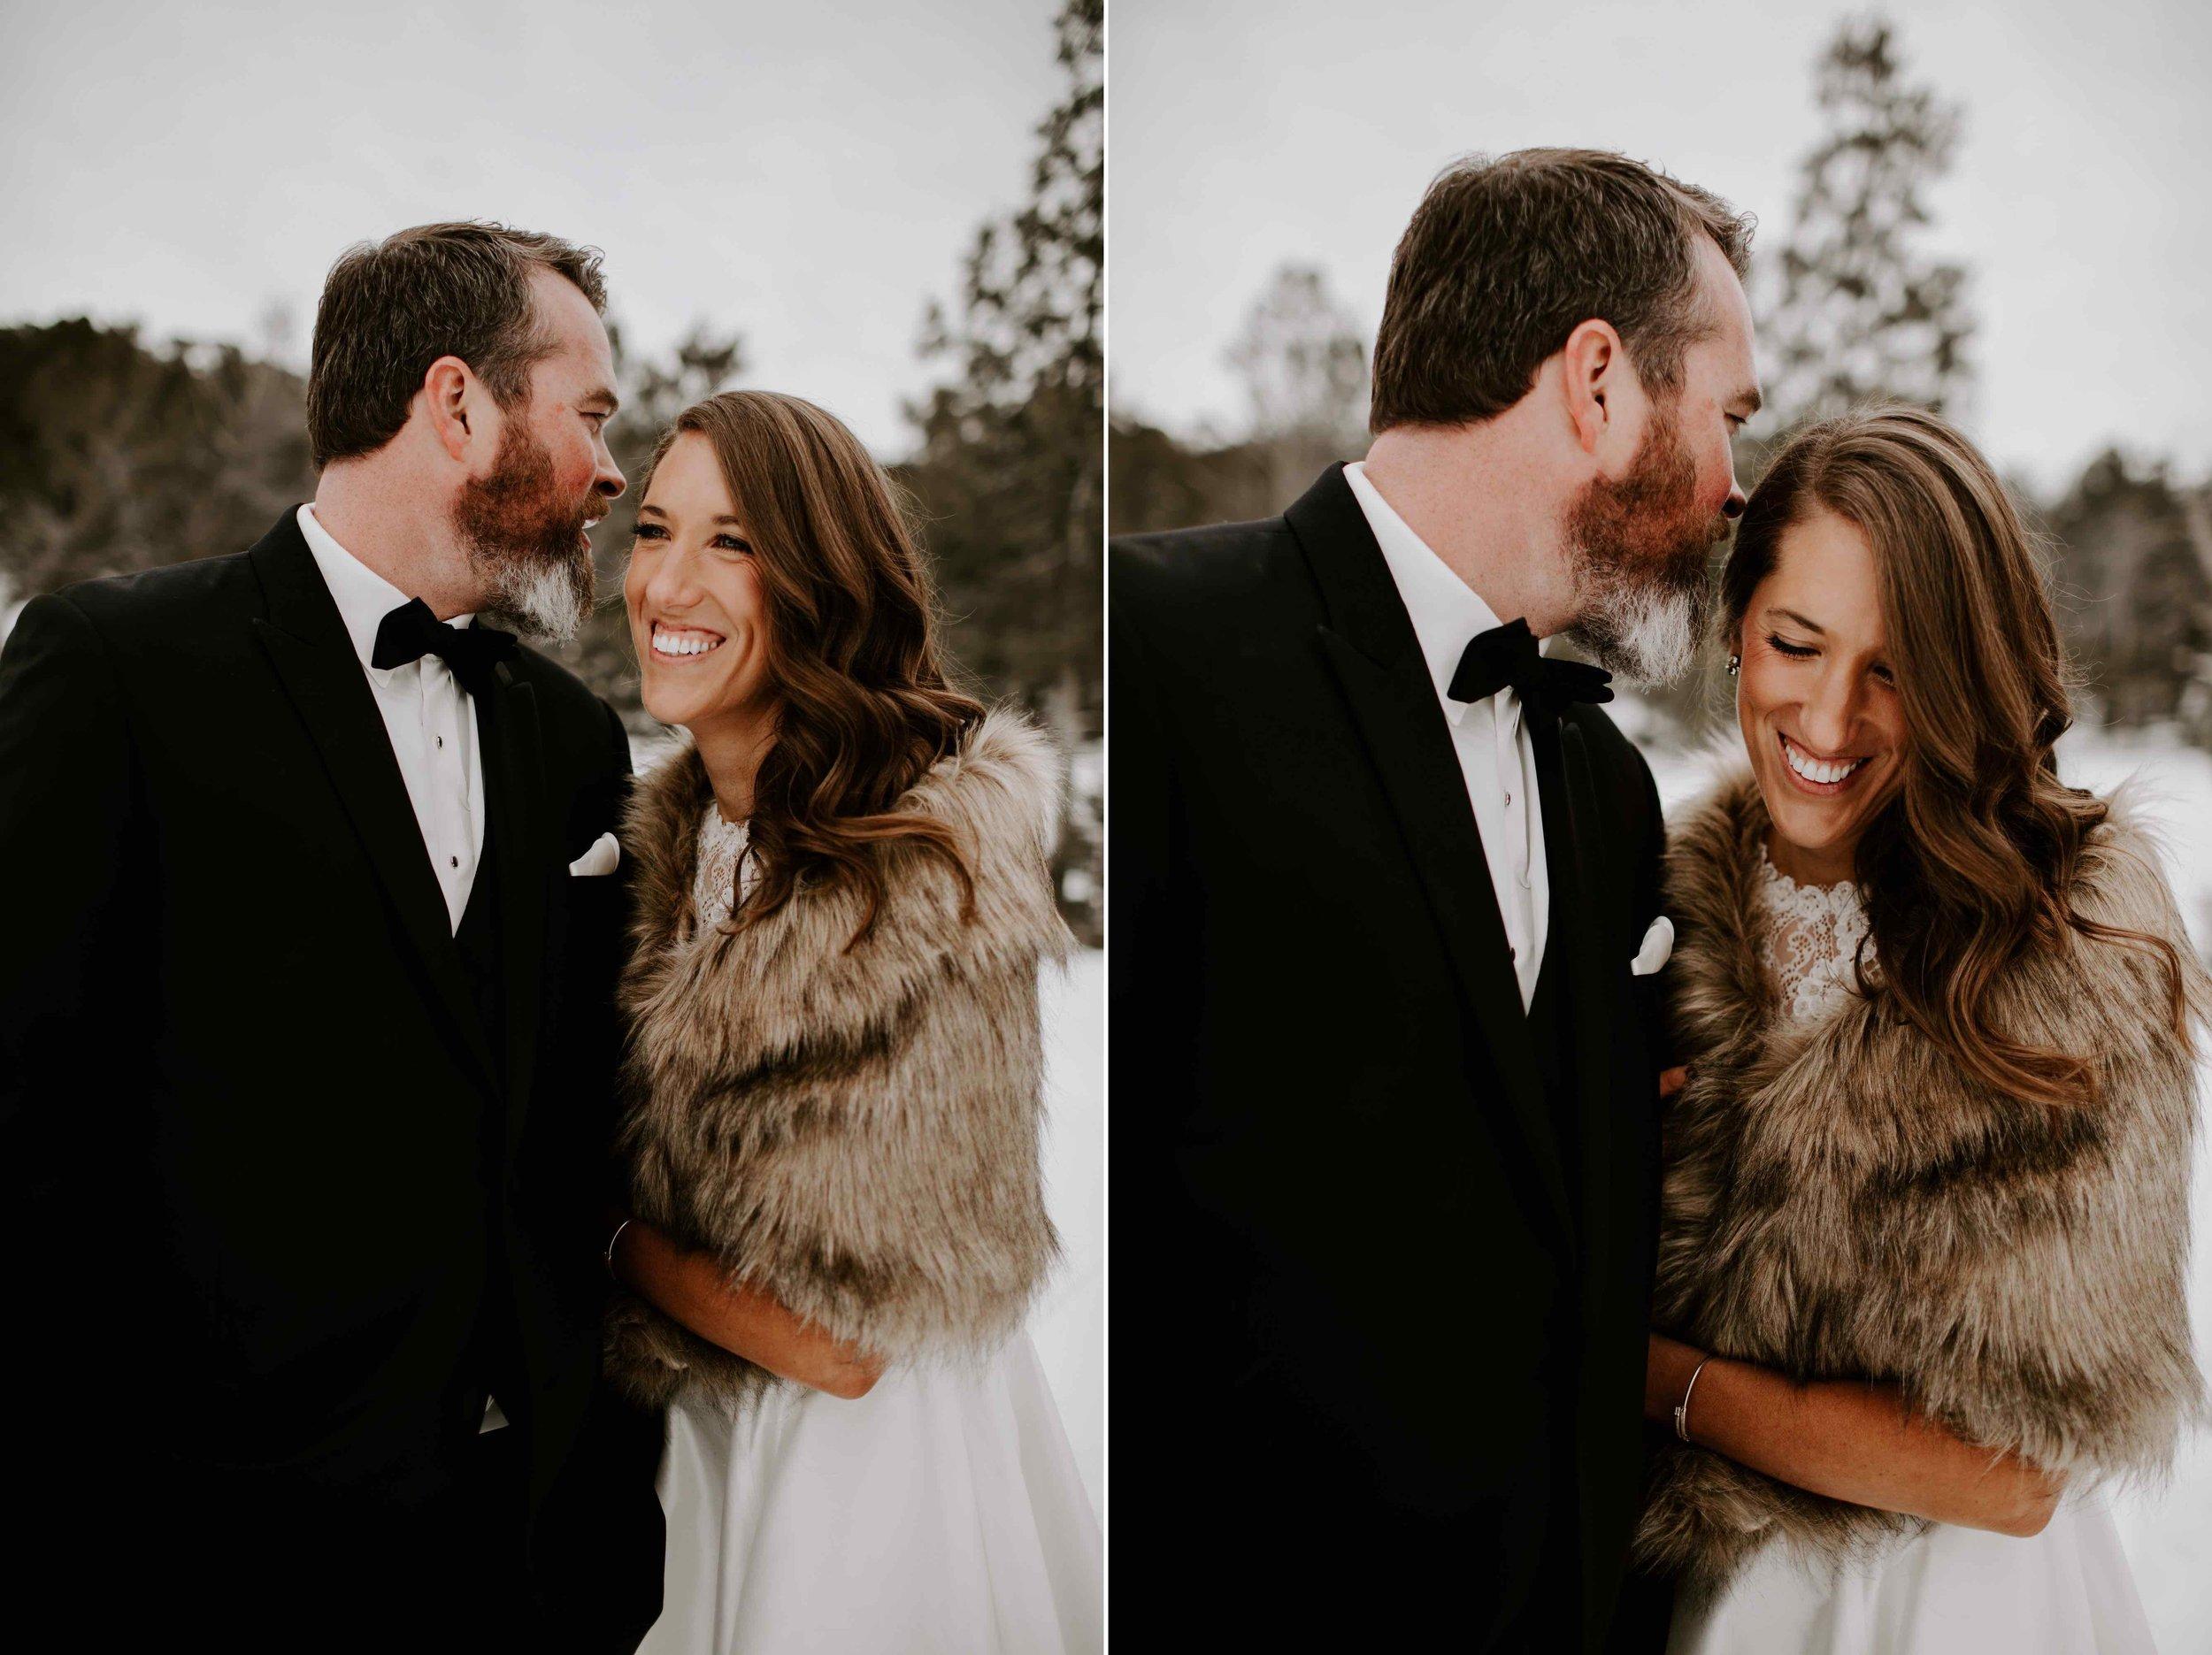 Kisa Conrad Favorites-0039-colorado-wedding-photographer-denver-springs-vailhotel-glenwood-springs-colorado-wedding-photographer.jpeg